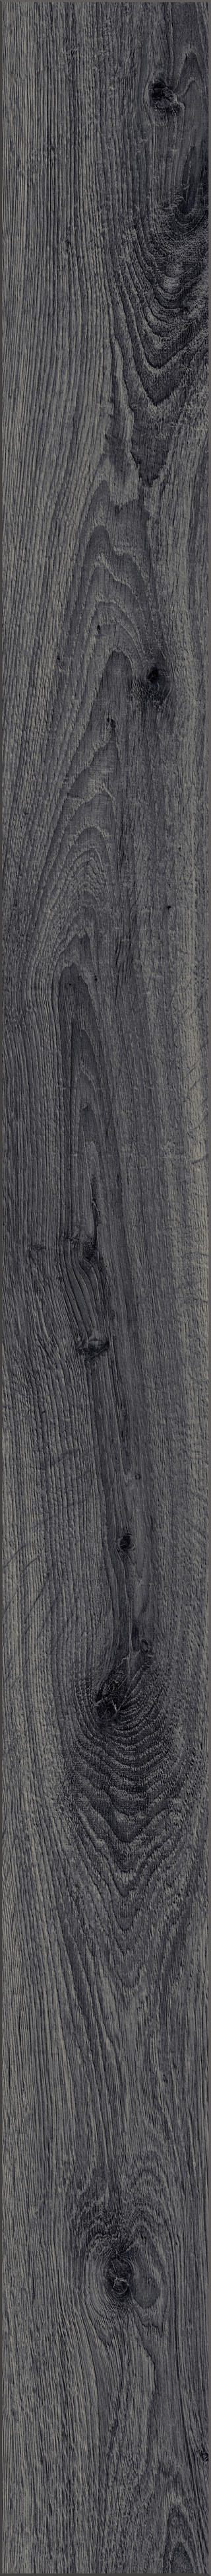 kronotex amazone laminat prestige eiche grau d 4167 von kronotex. Black Bedroom Furniture Sets. Home Design Ideas